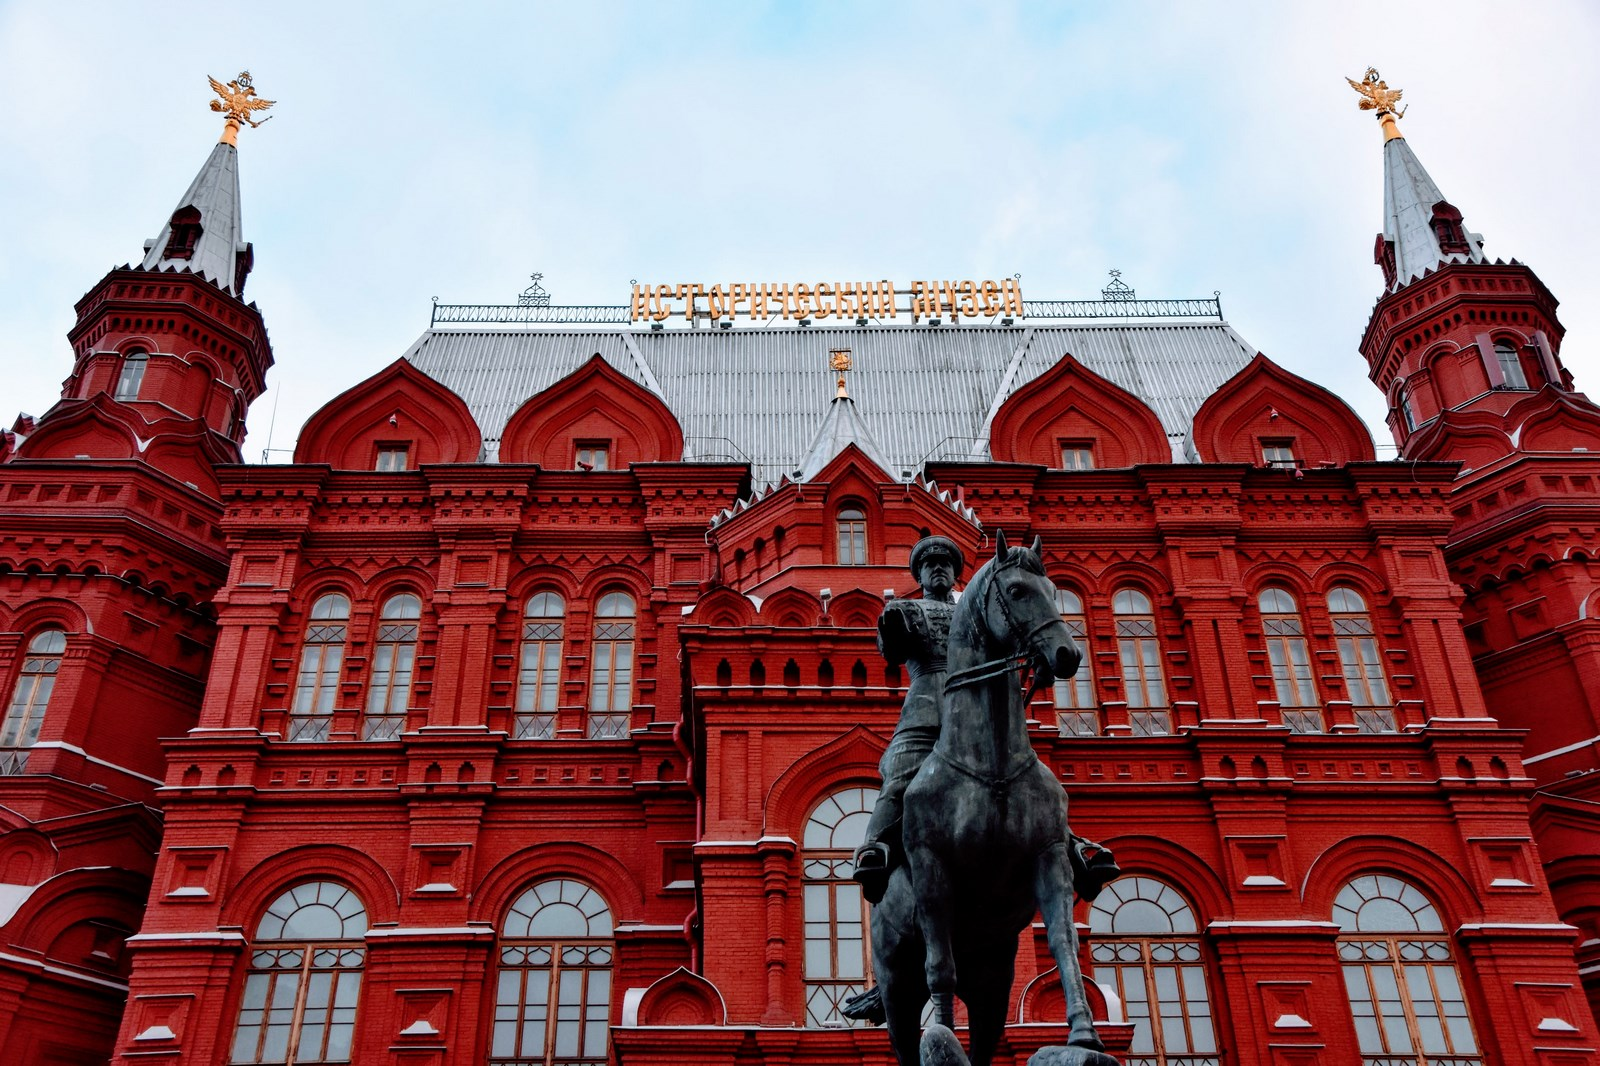 Moscow (Mocква, Moskwa) | Russia (Россия, Rossija, Rosja)